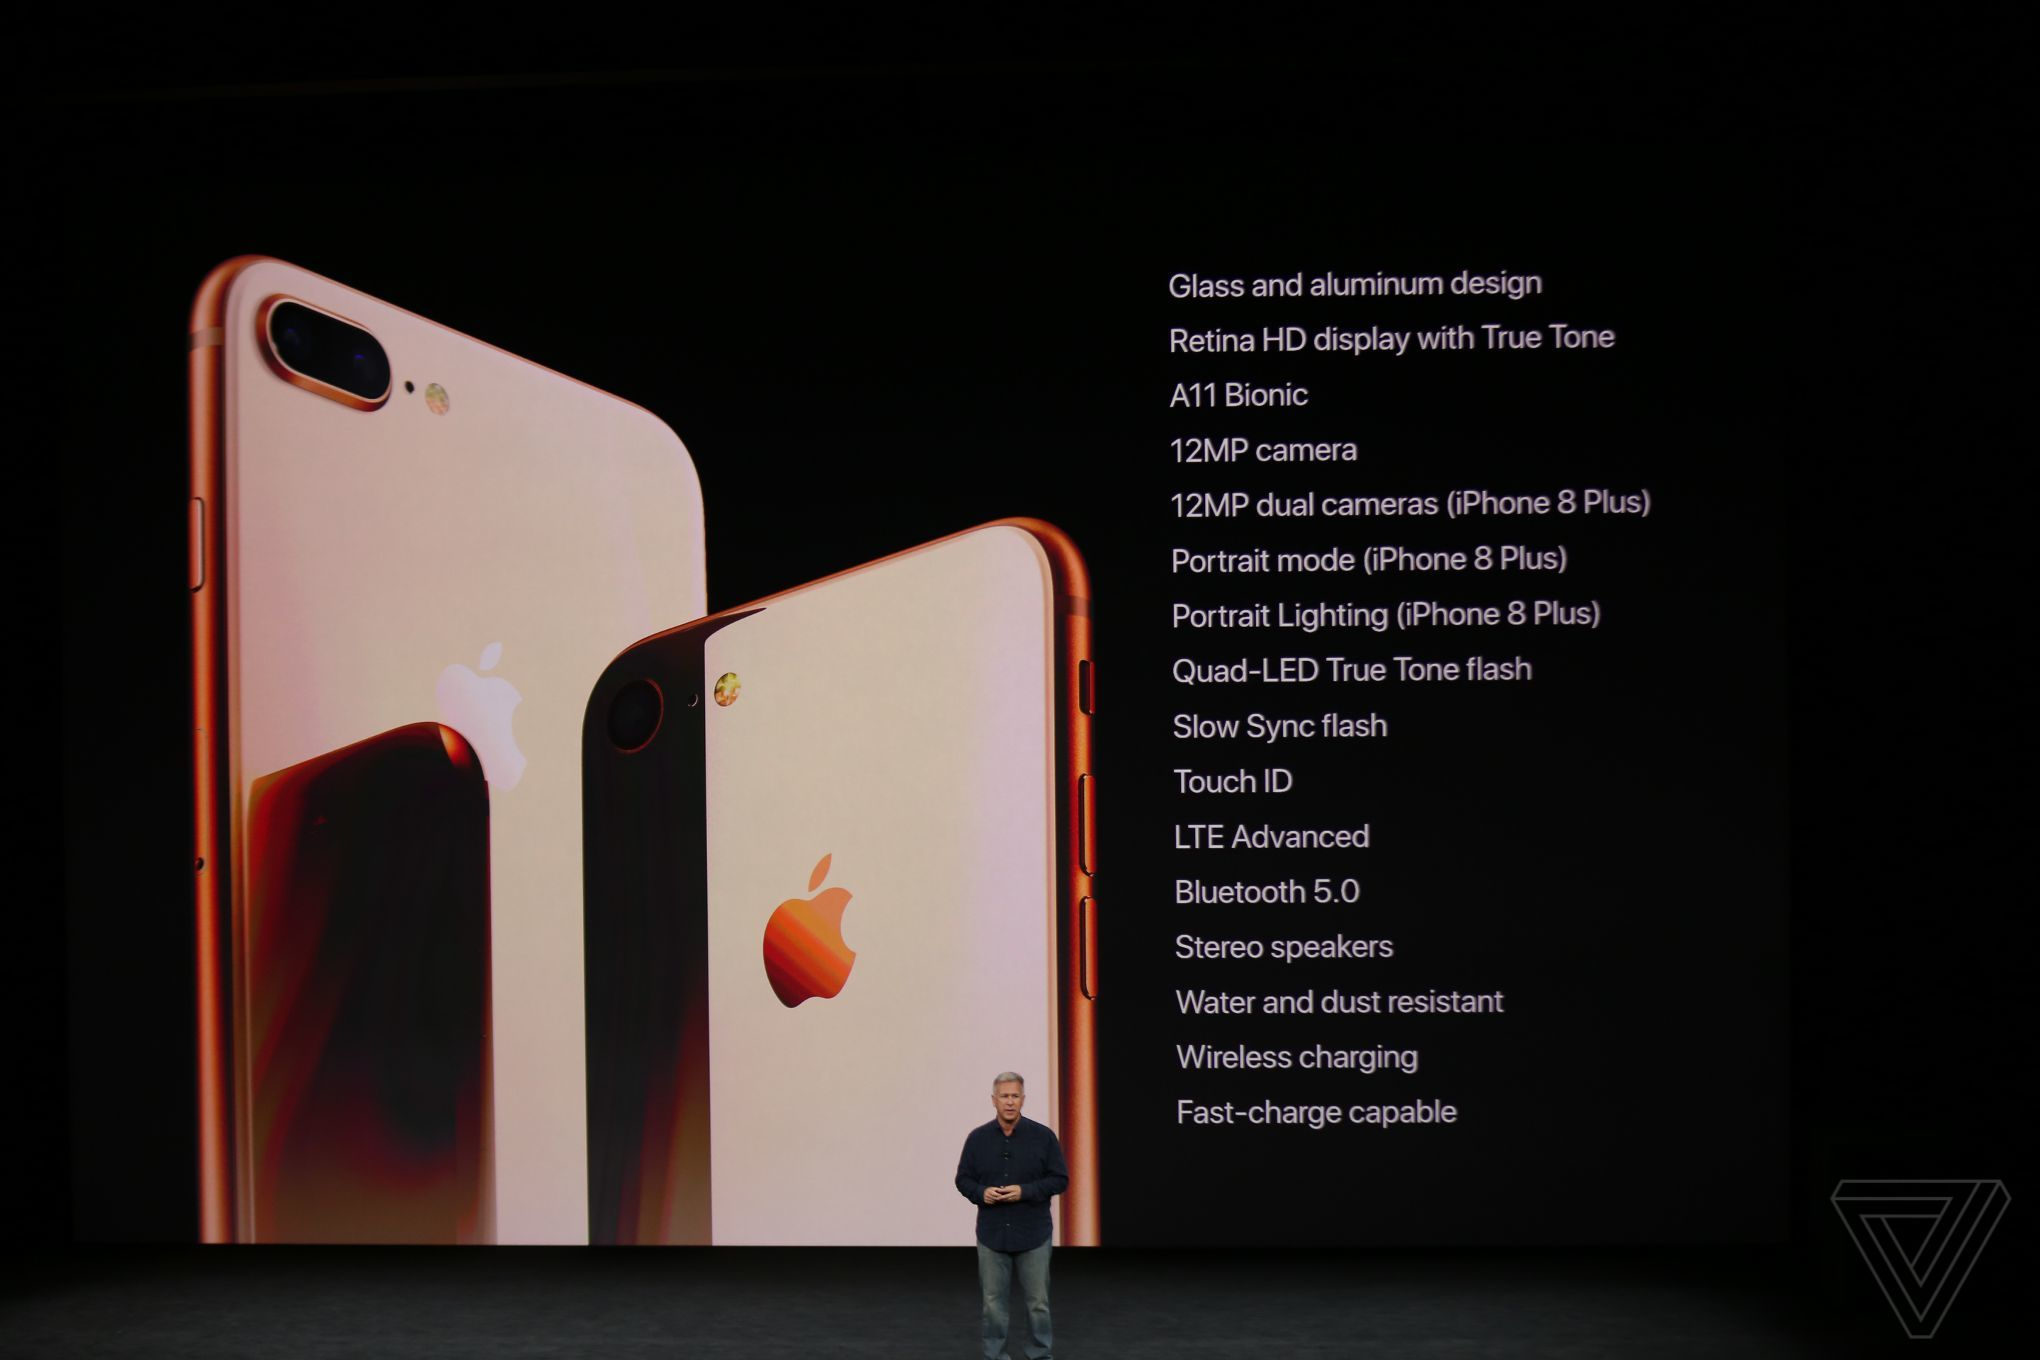 apple-iphone-2017-20170912-11554.JPG